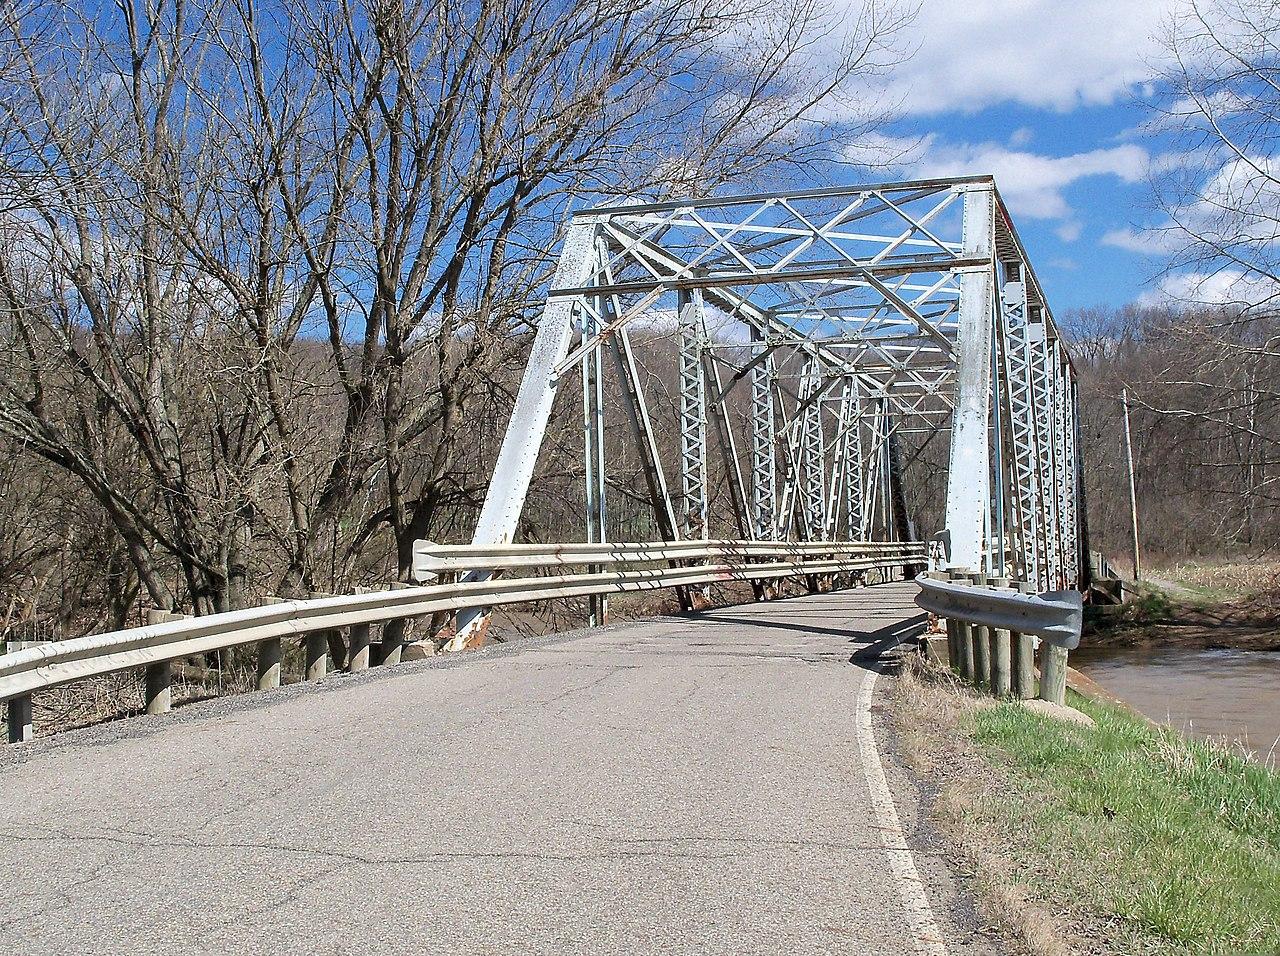 Ohio jefferson county bergholz - One Lane Bridge Over Yellow Creek On County Road 53